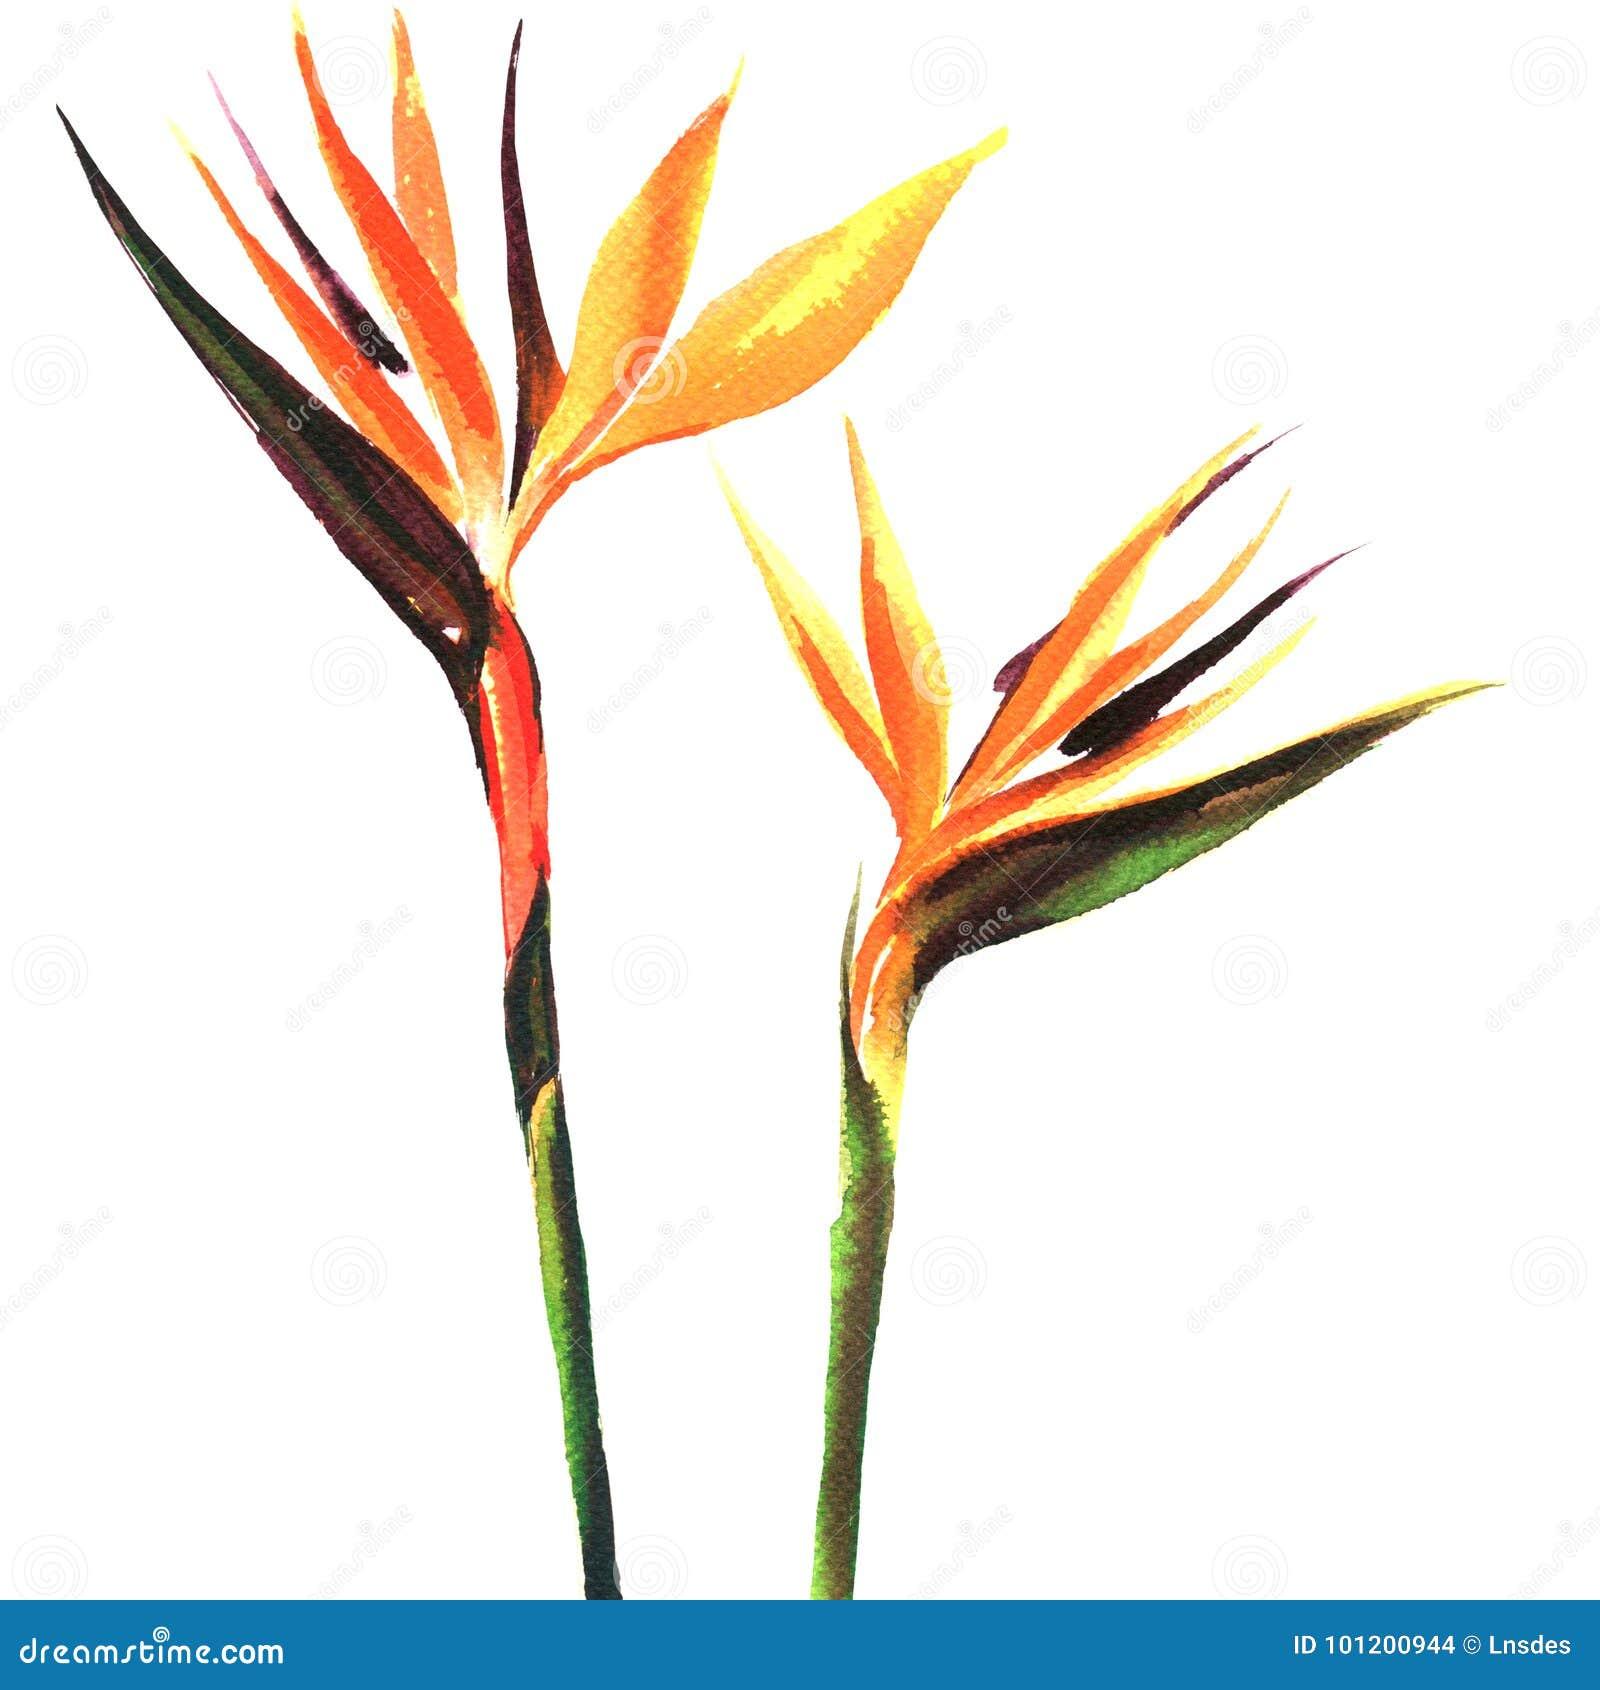 Strelitzia Bird Of Paradise Flower Two Flowers Isolated